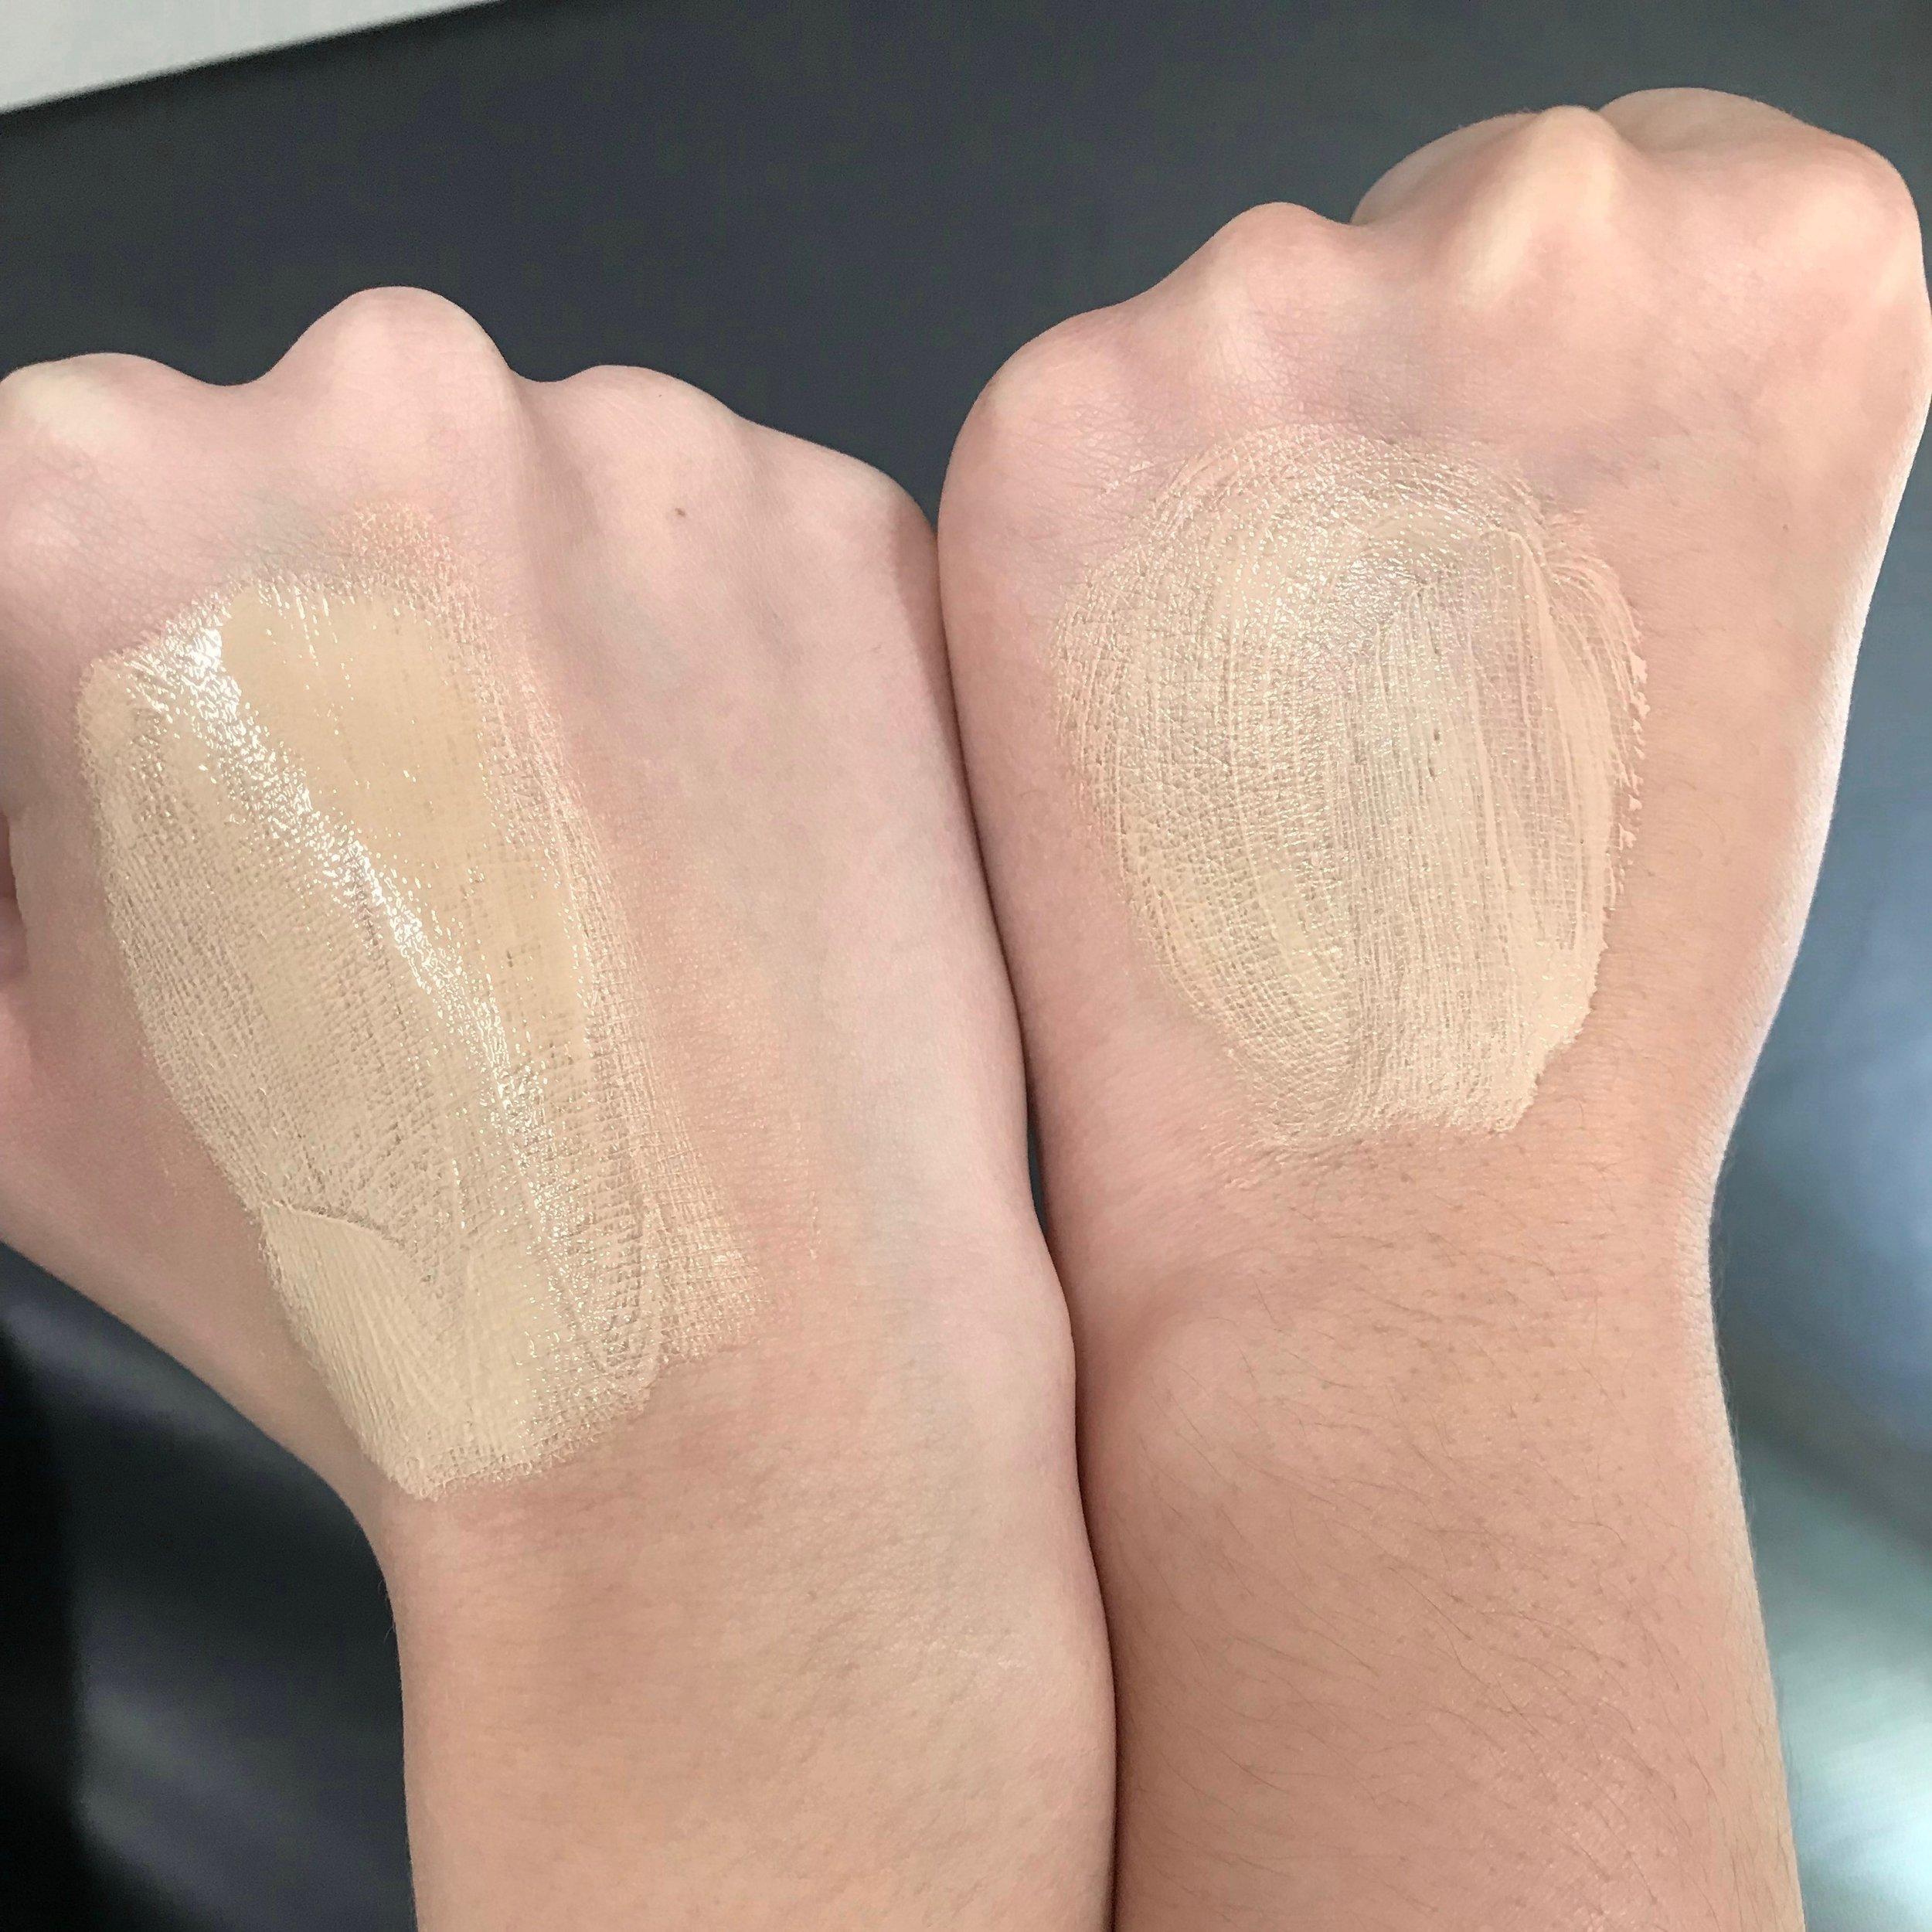 Platinum SPF 45 Daily Tinted BB Cream immediately on application.